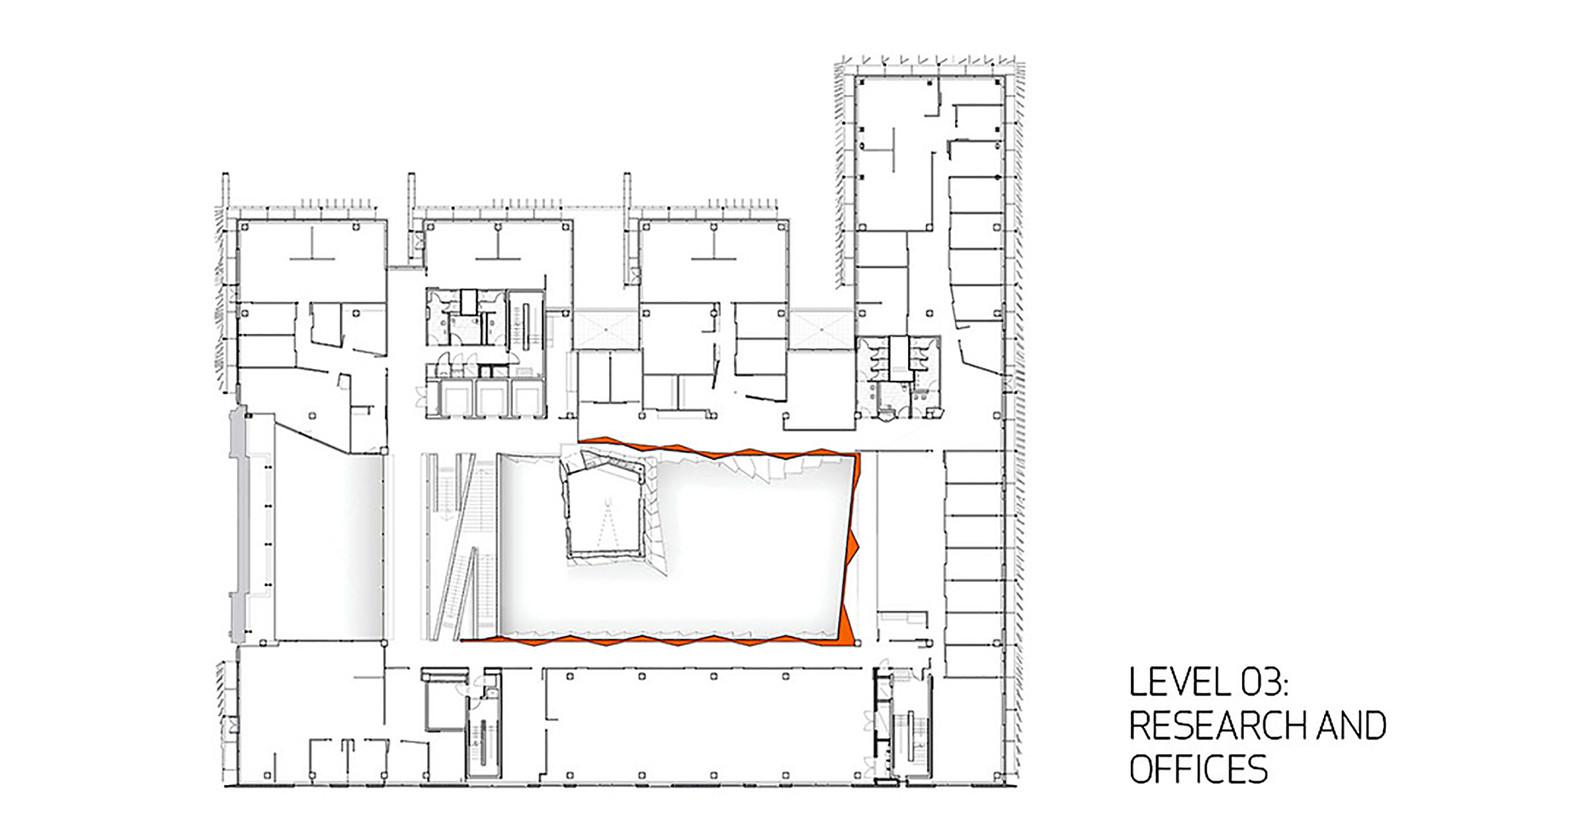 Melbourne school of design university of melbournethird floor plan